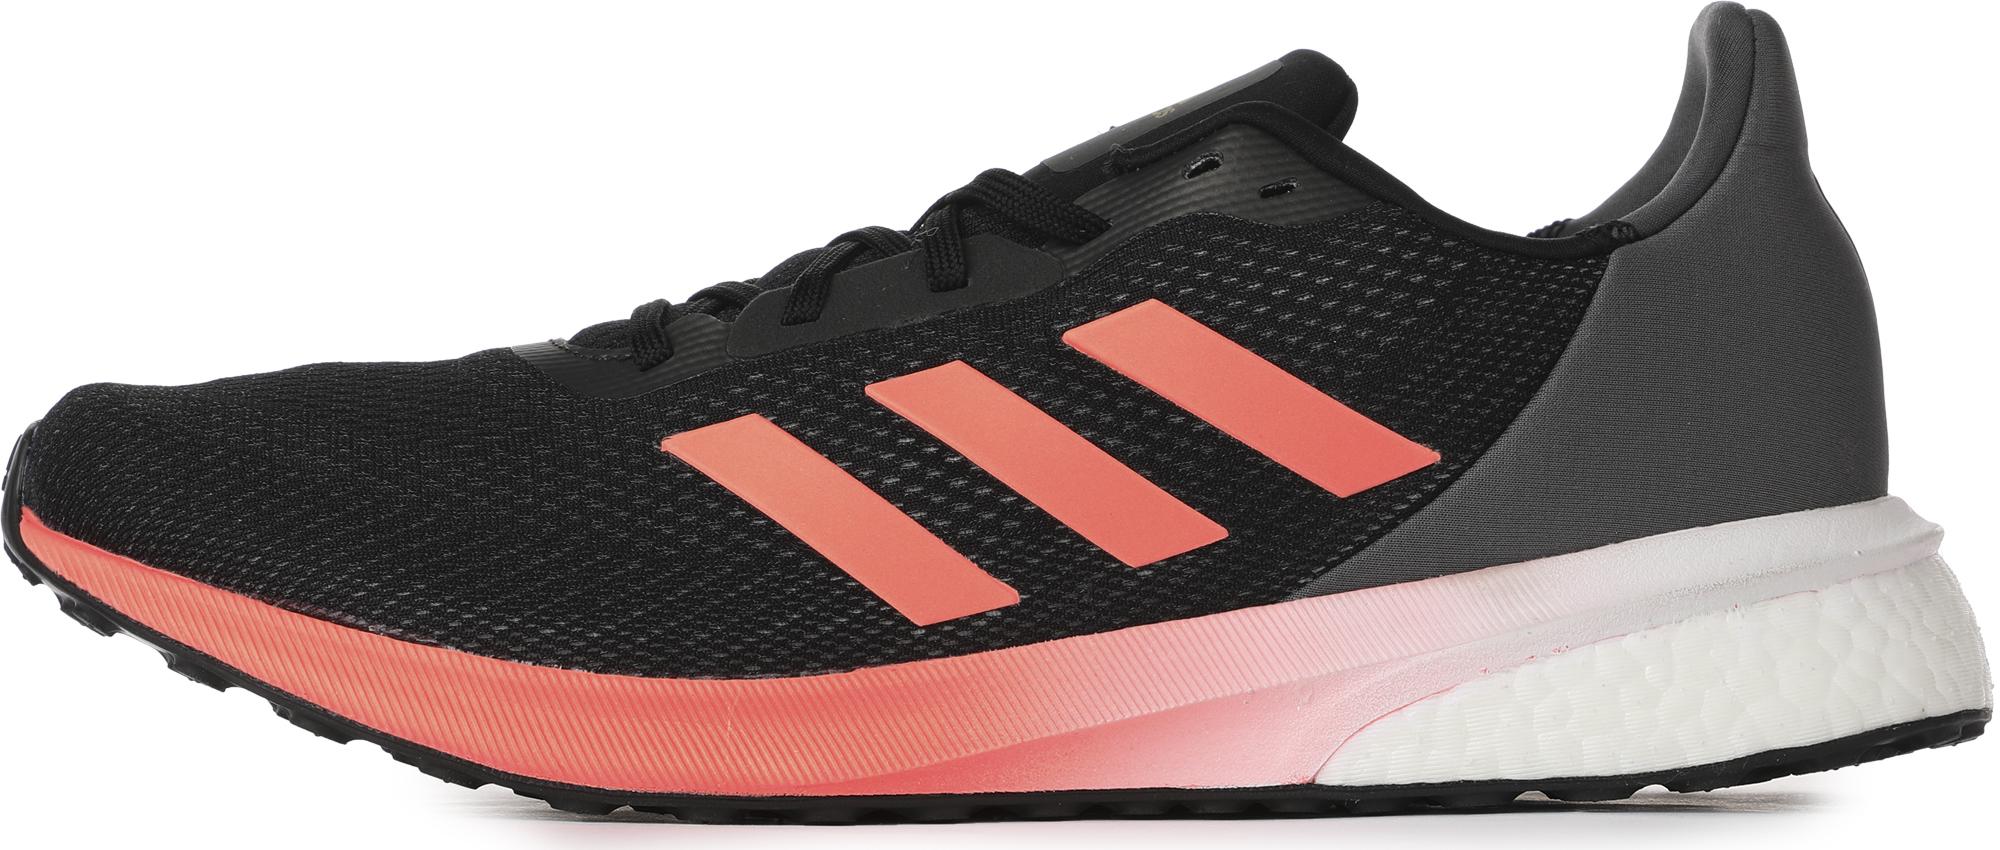 Adidas Кроссовки мужские Adidas Astrarun, размер 42.5 баскетбольные кроссовки adidas rose boost rose derrick